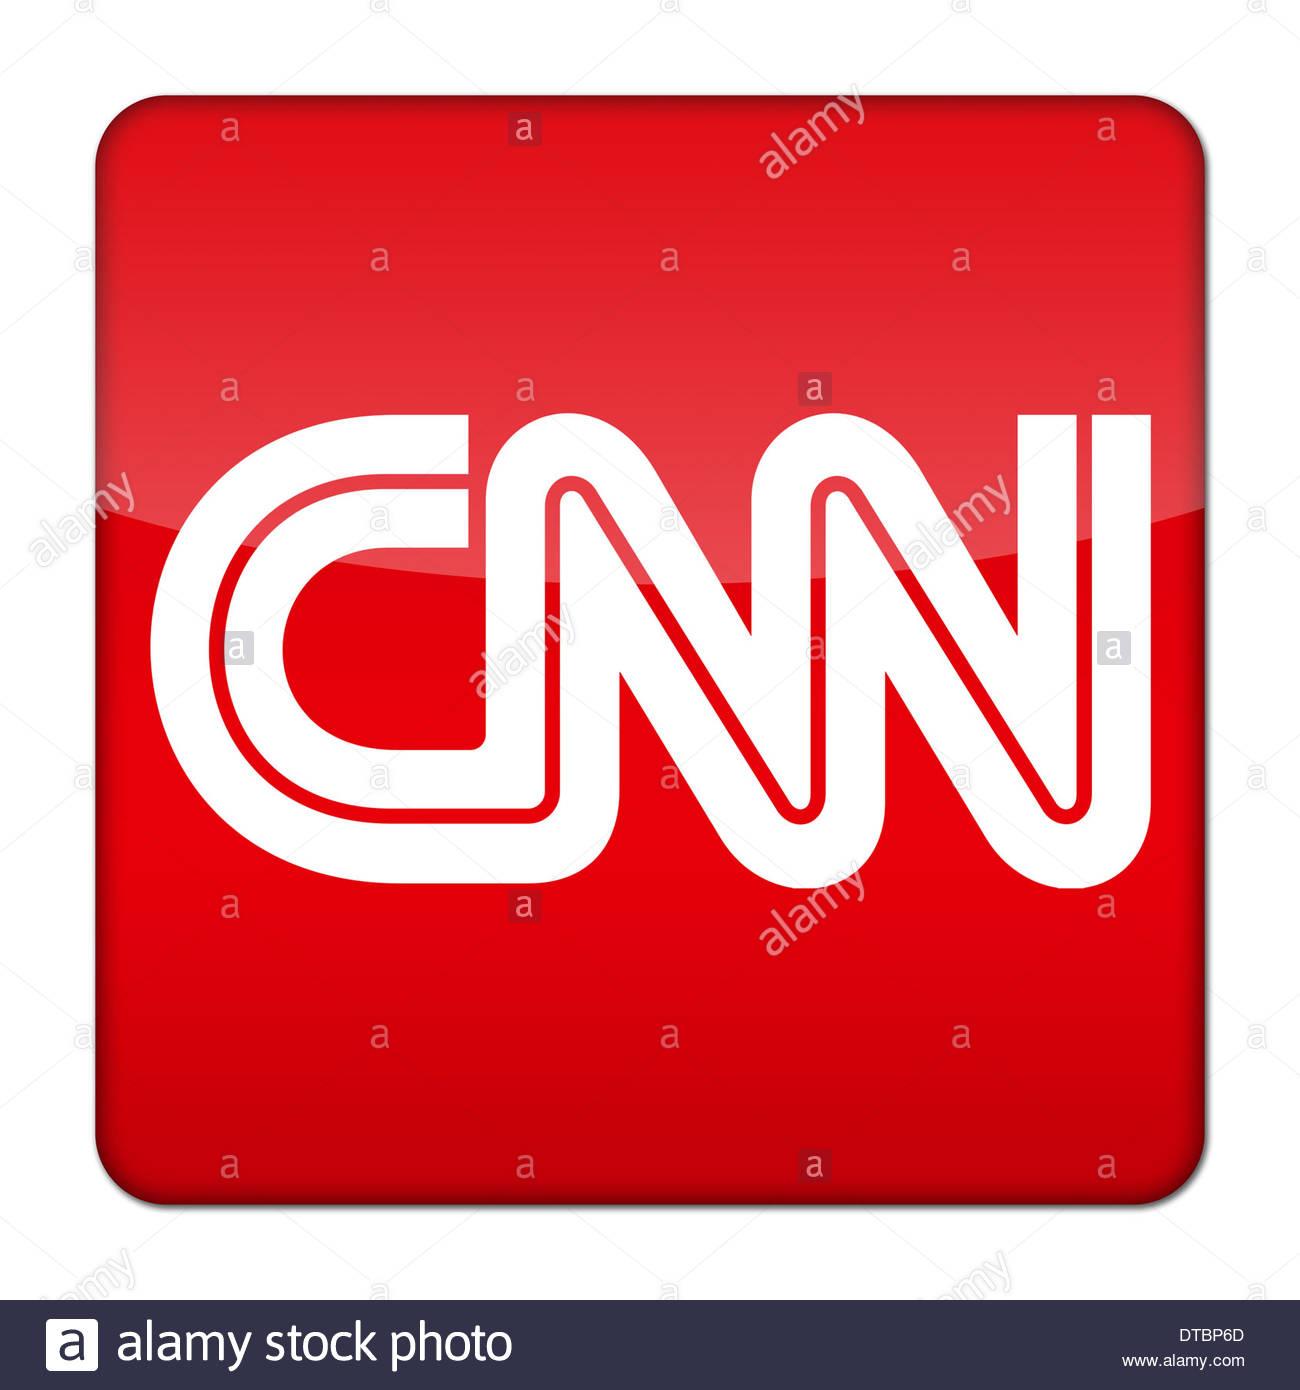 cnn news logo icon button app stock photo royalty free